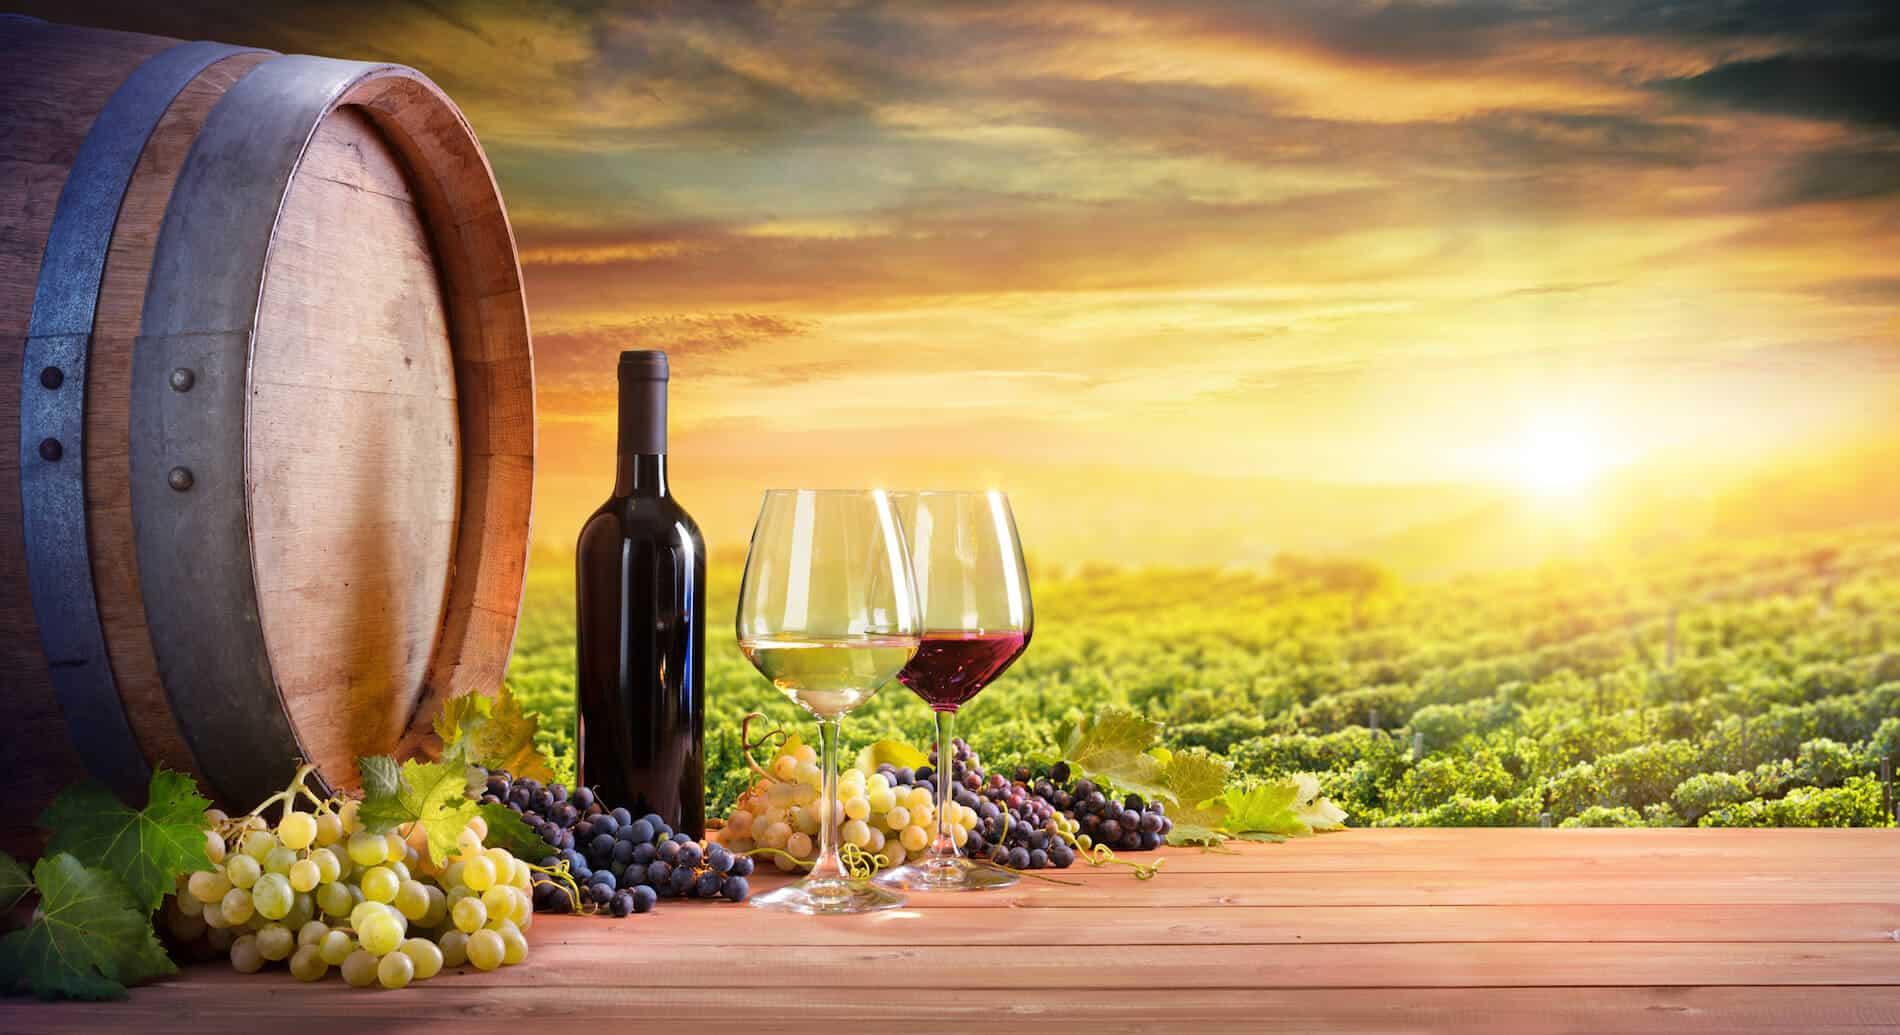 Italy wine festival